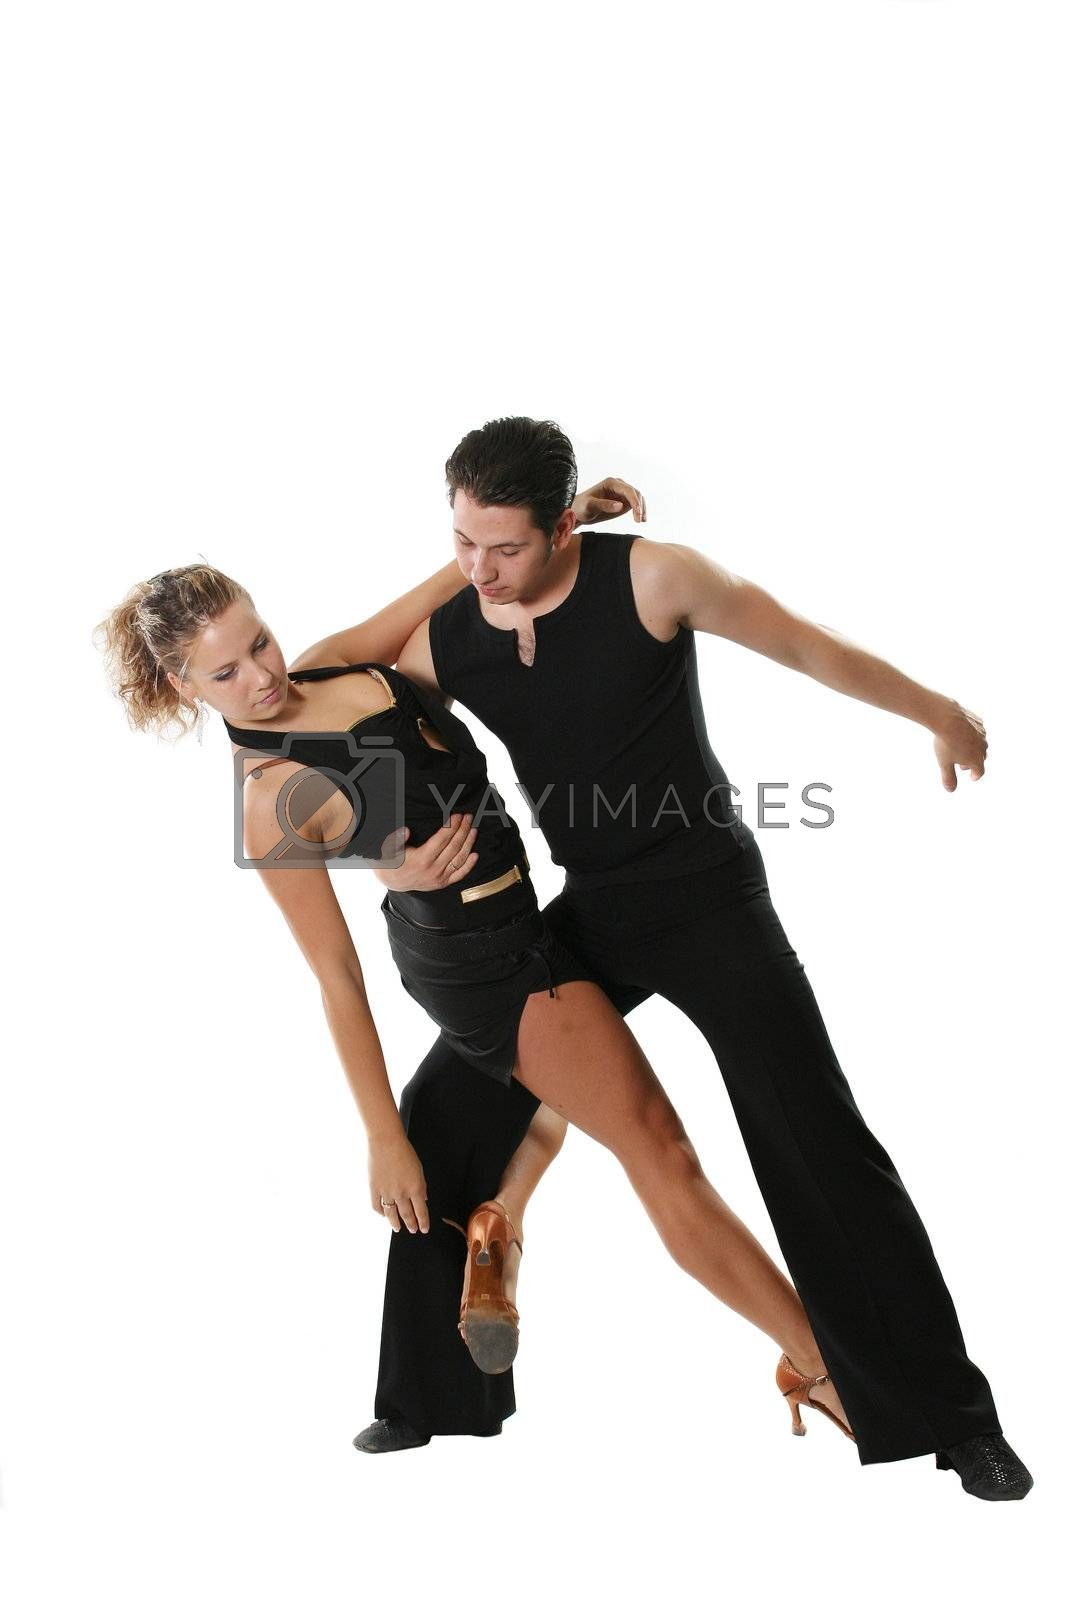 dancer dancing american latin couple beauty isolated